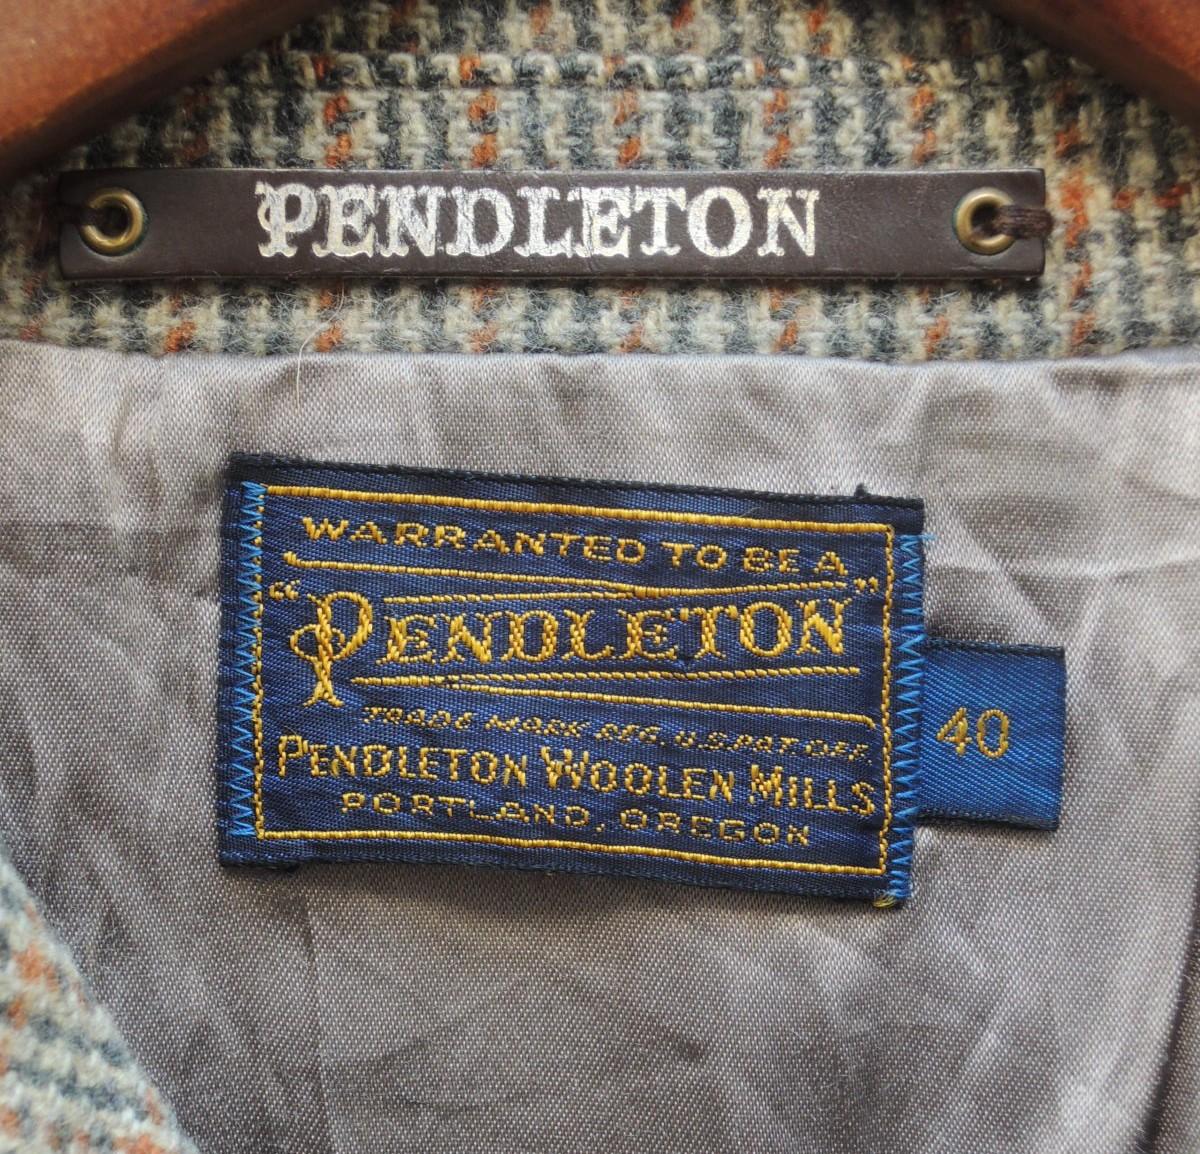 pendletoncoat03.JPG